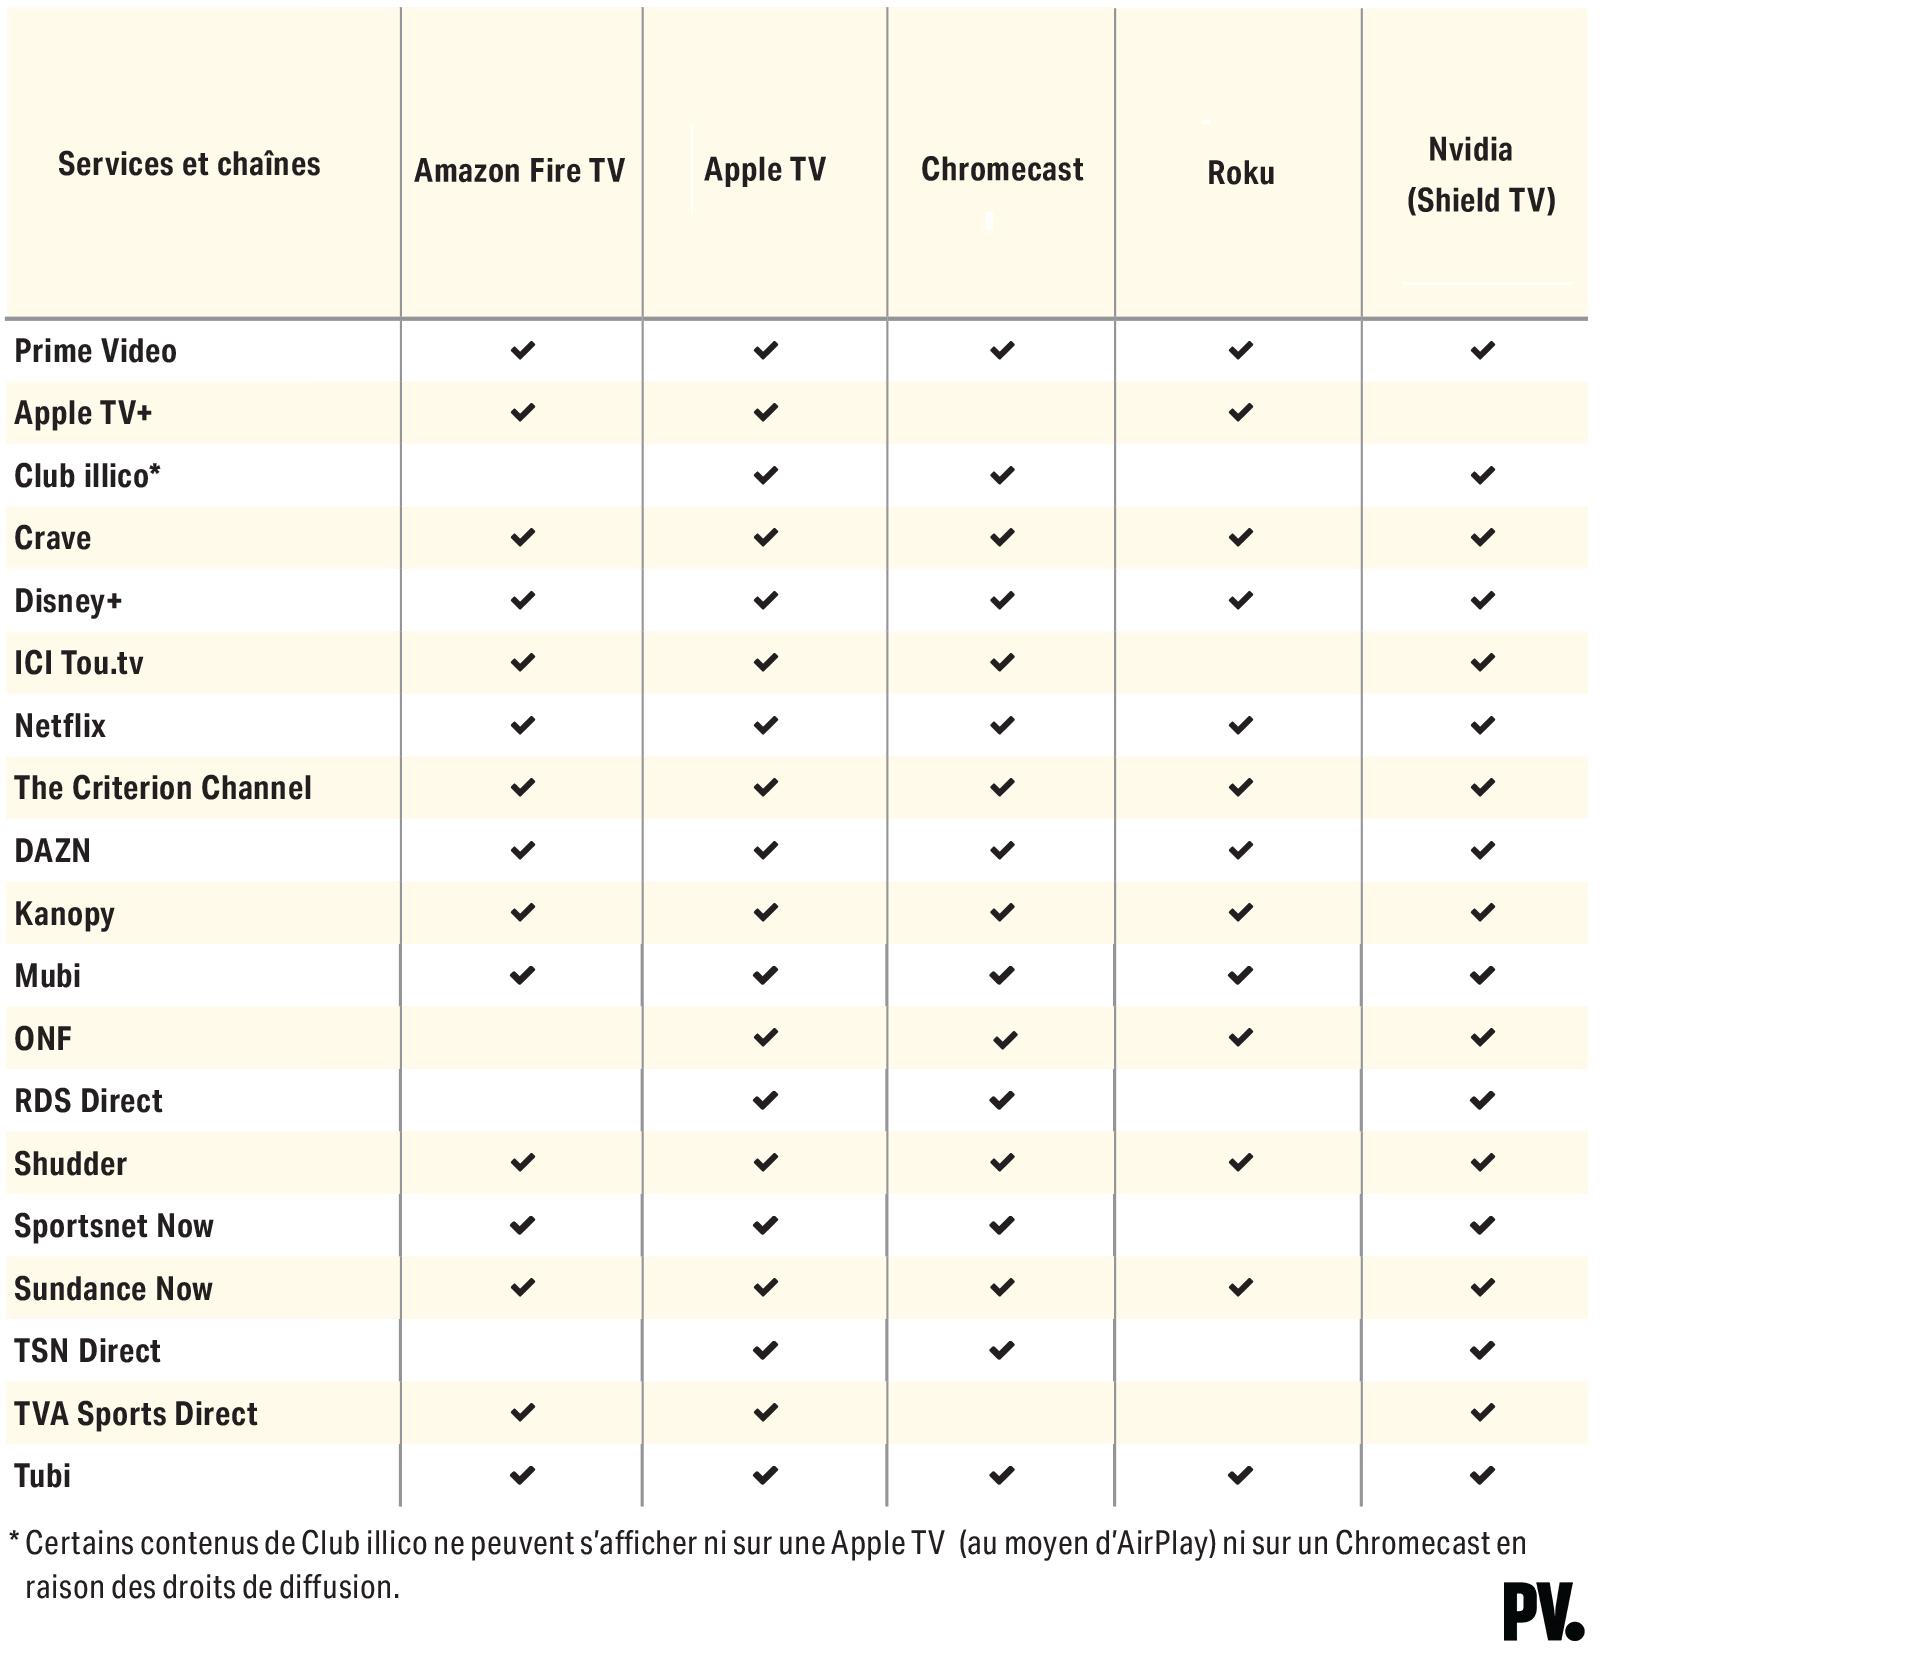 tableau-services-diffusion-continu